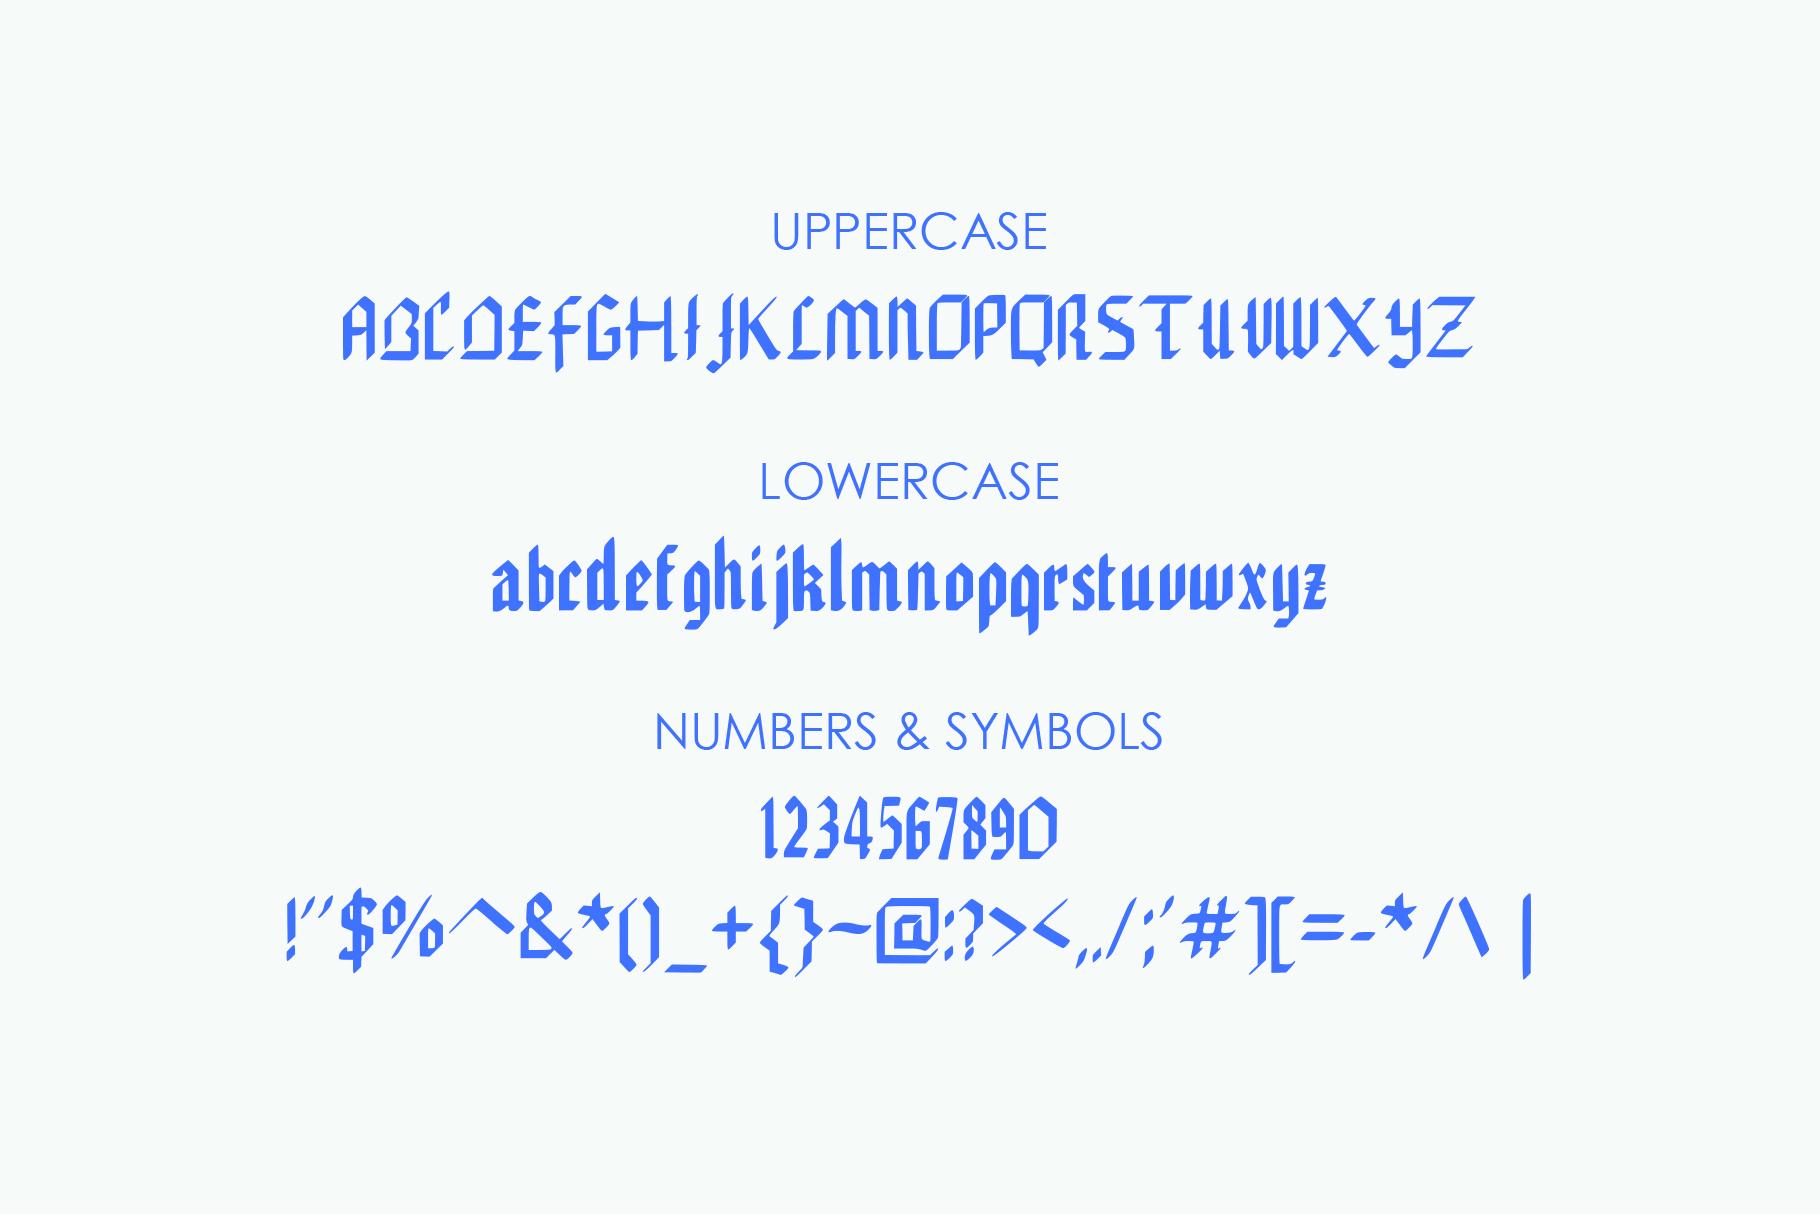 EDGAR, Handmade Gothic Typeface example image 4